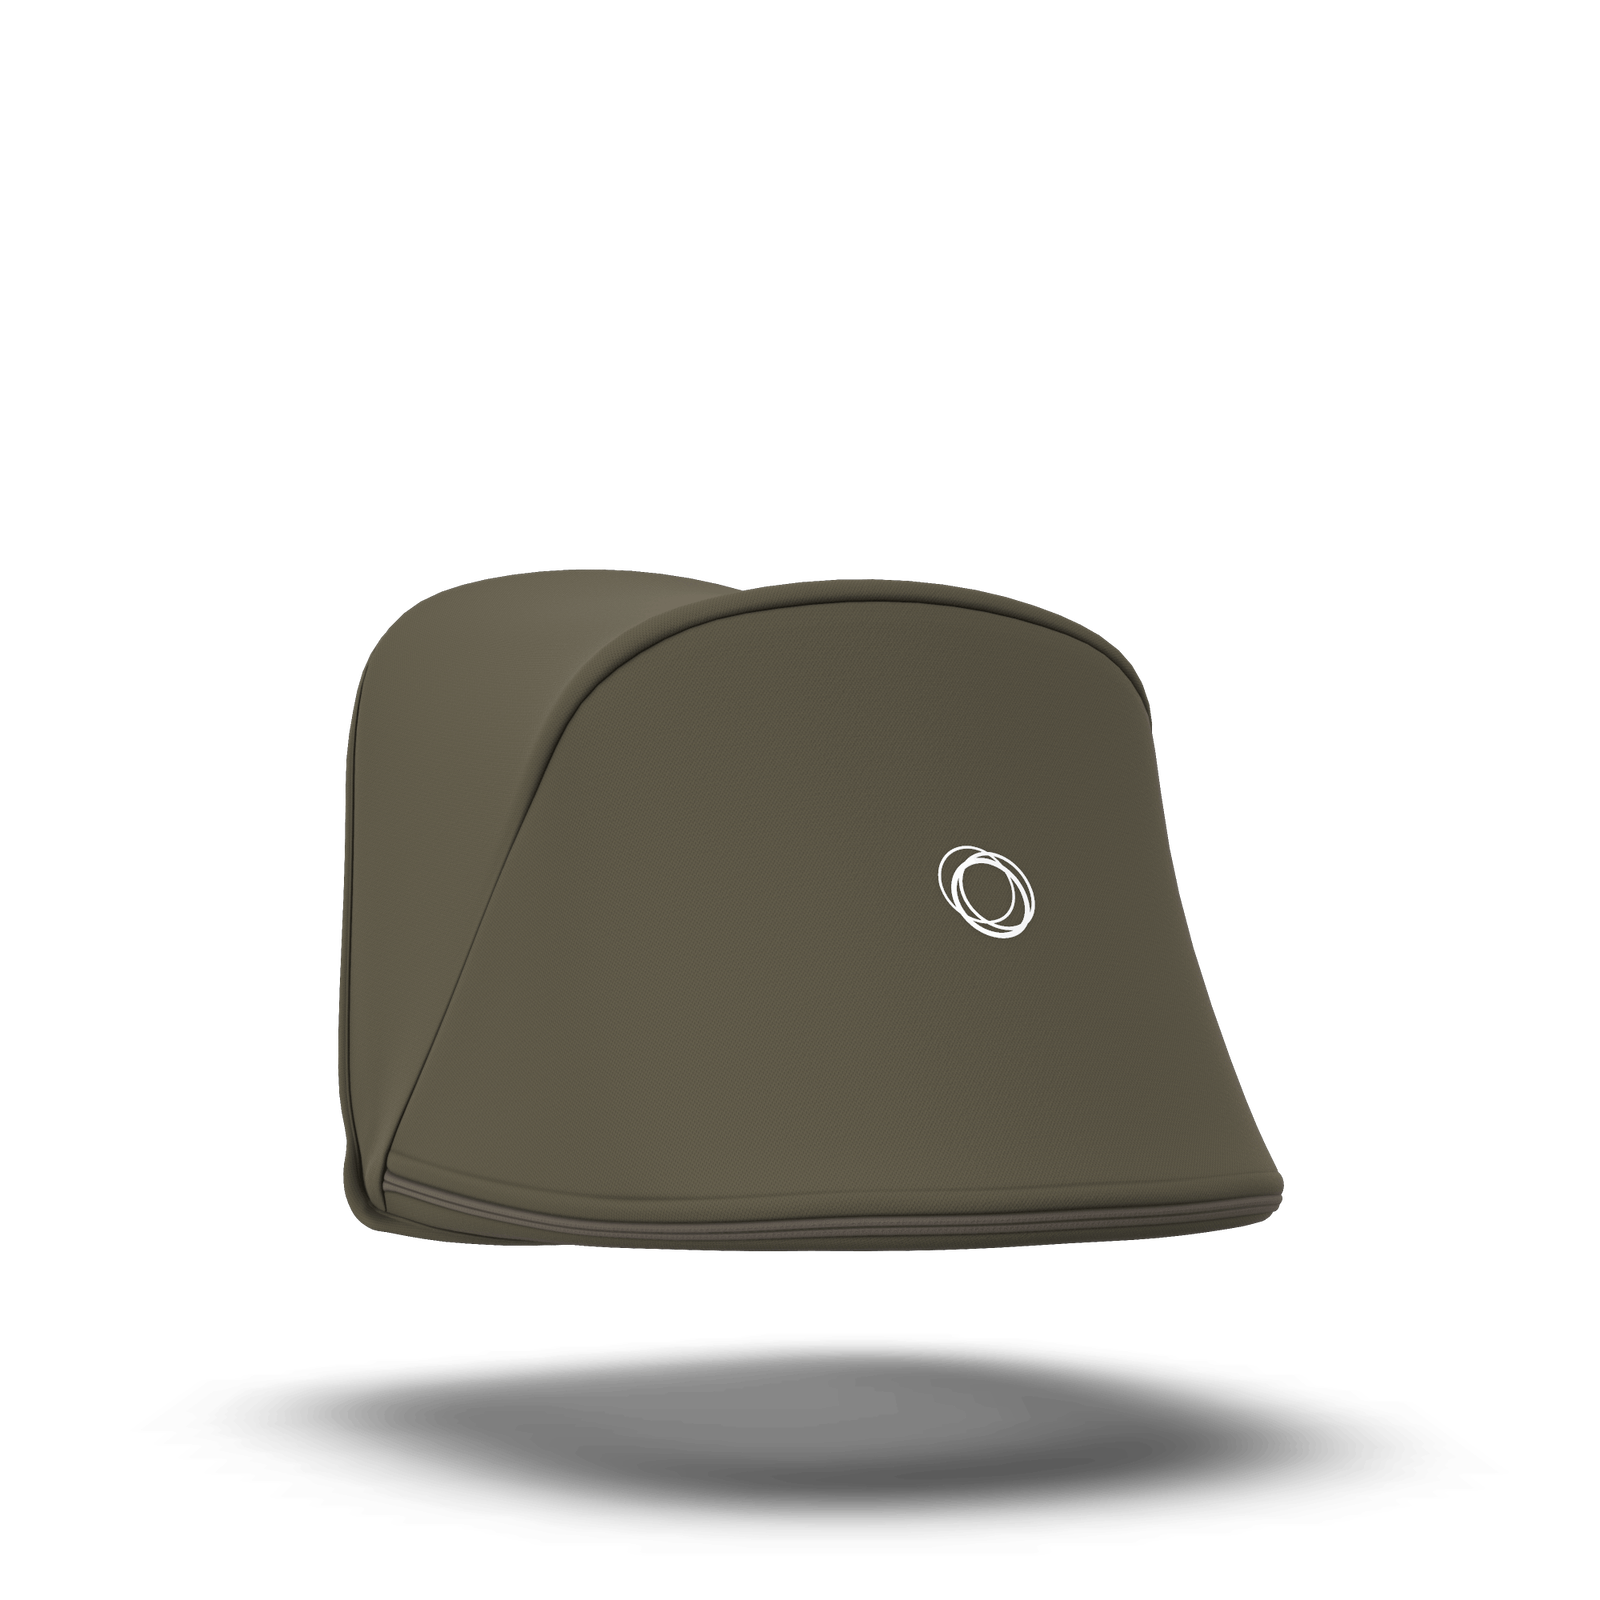 Bugaboo Fox/Cameleon 3 sun canopy